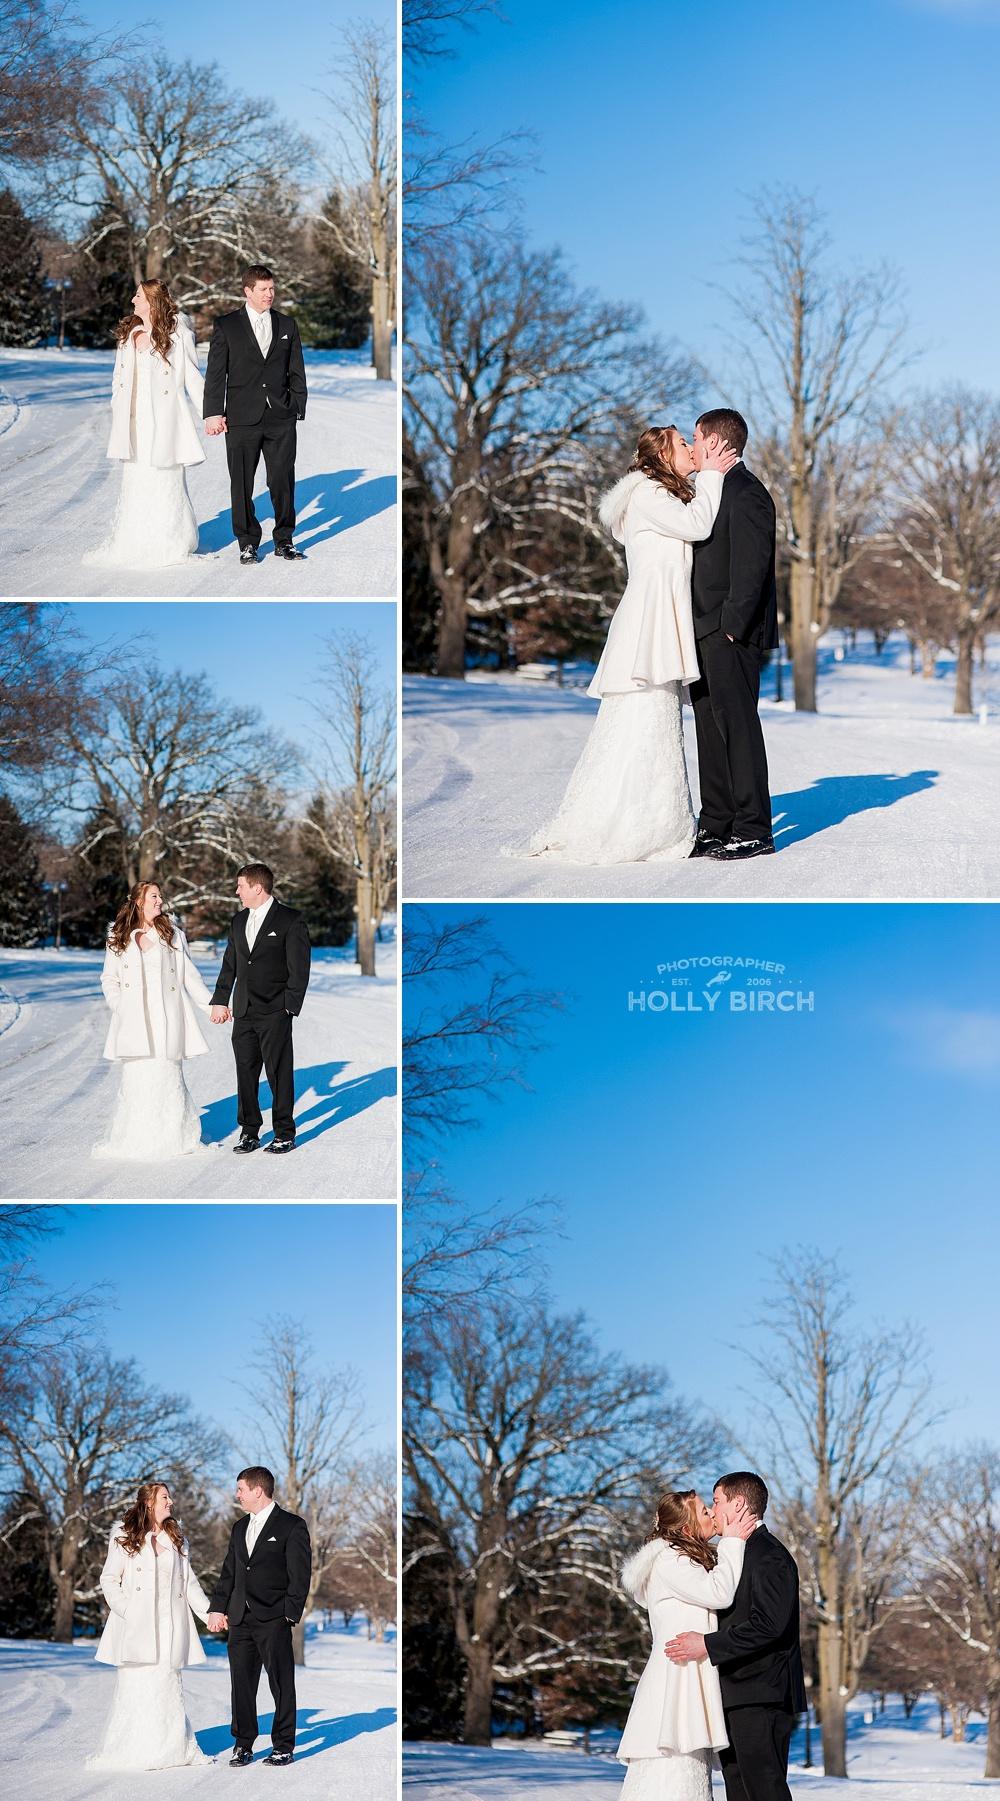 Bloomington-Normal-wedding-Holiday-Inn-airport-wedding_3129.jpg